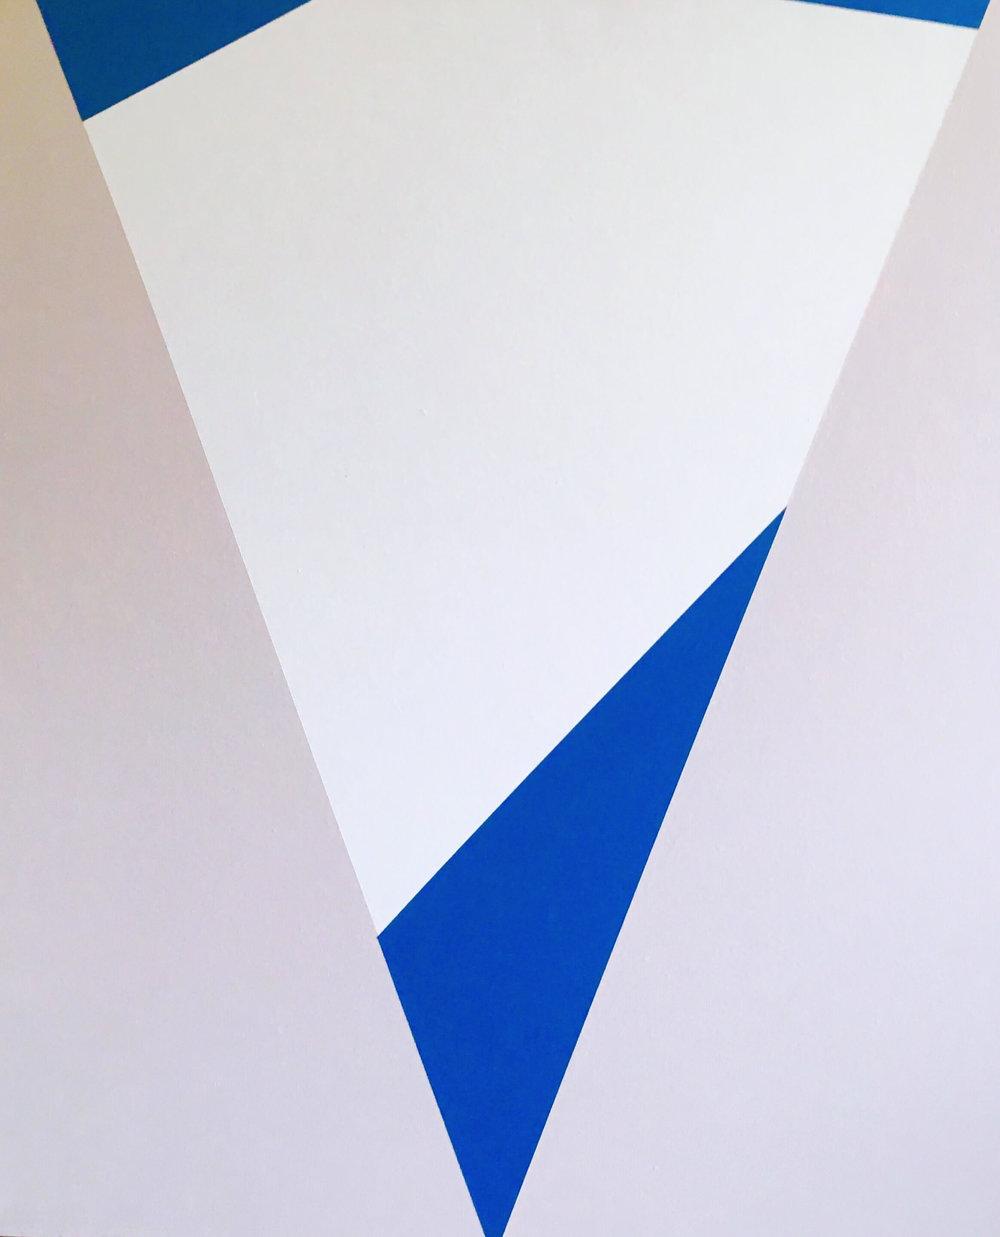 Minimal 18, 60 cm x 50 x 4 cm, Acryl auf Leinwand, © Ute Latzke, 2016, Preis: 300 Euro.